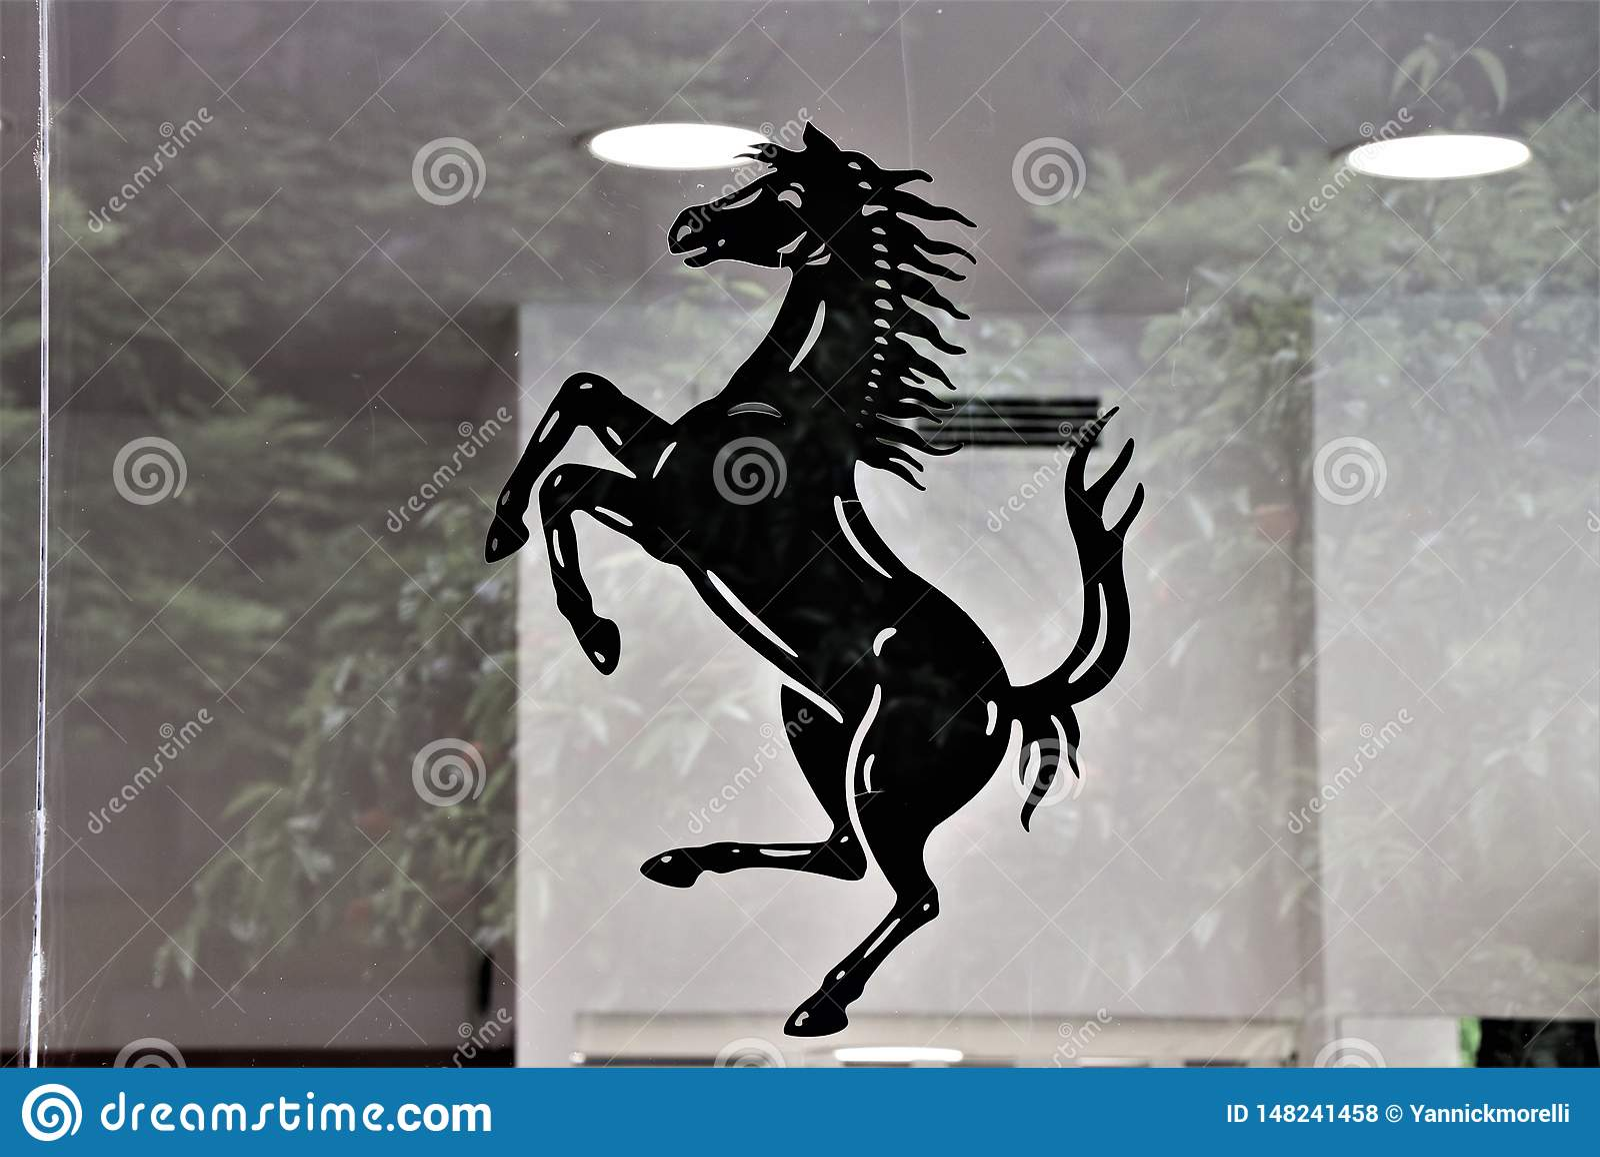 Symbol Of The Ferrari And Showcase Of A Ferrari Store Editorial Stock Photo Image Of Accessories Clothes 148241458